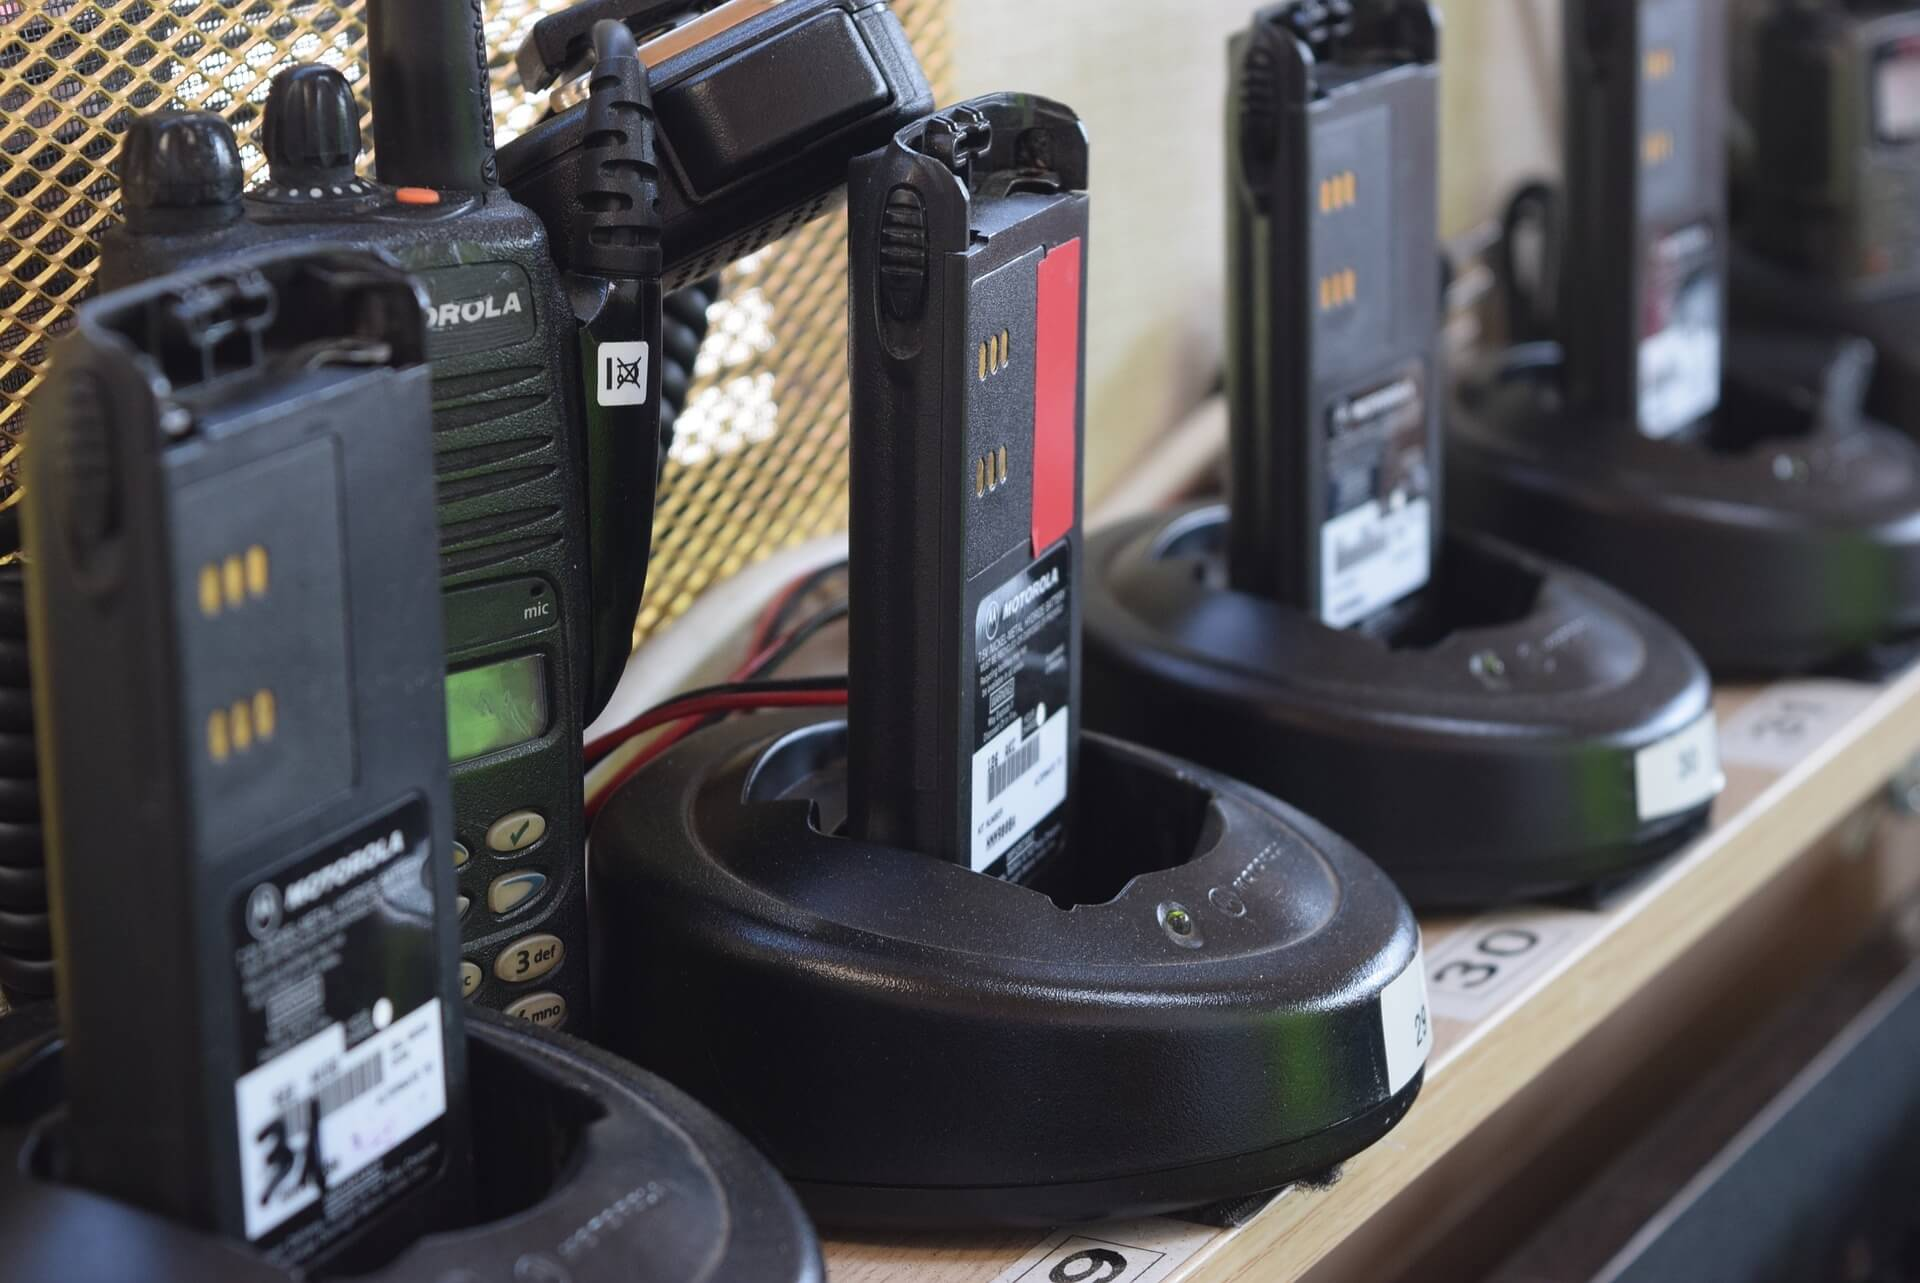 walkie-talkie-780308_1920